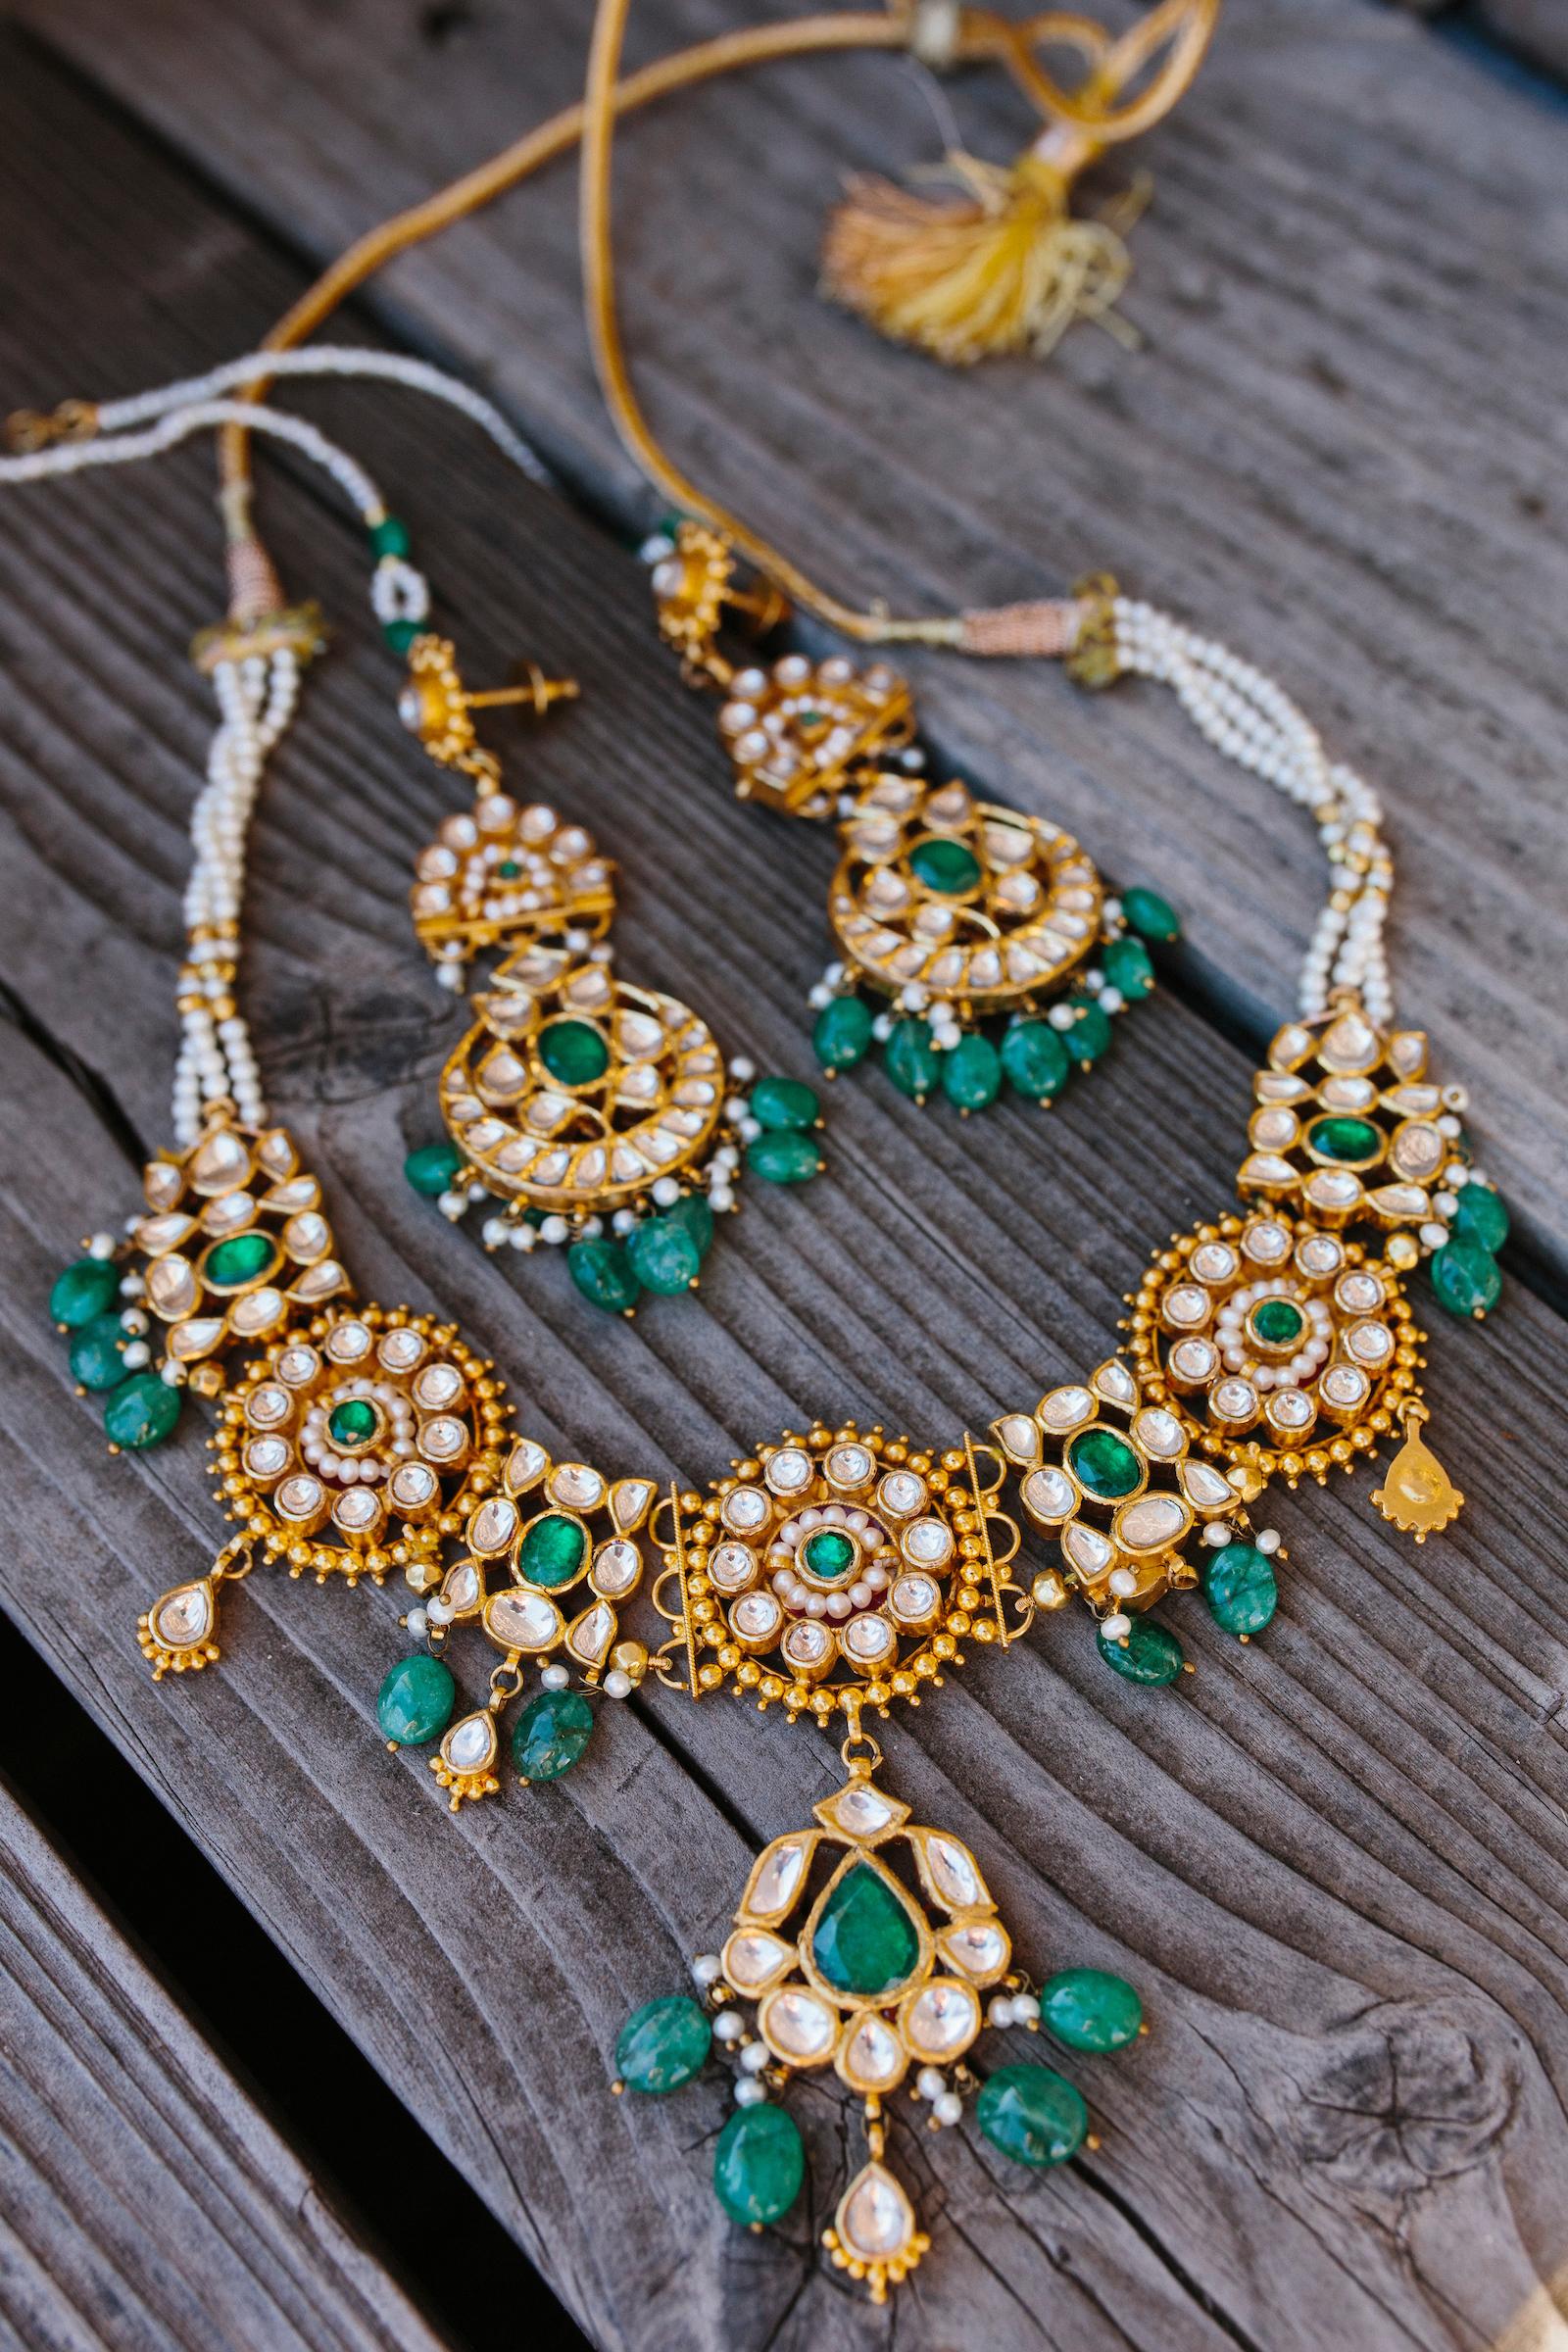 Hindu Wedding Jewelry